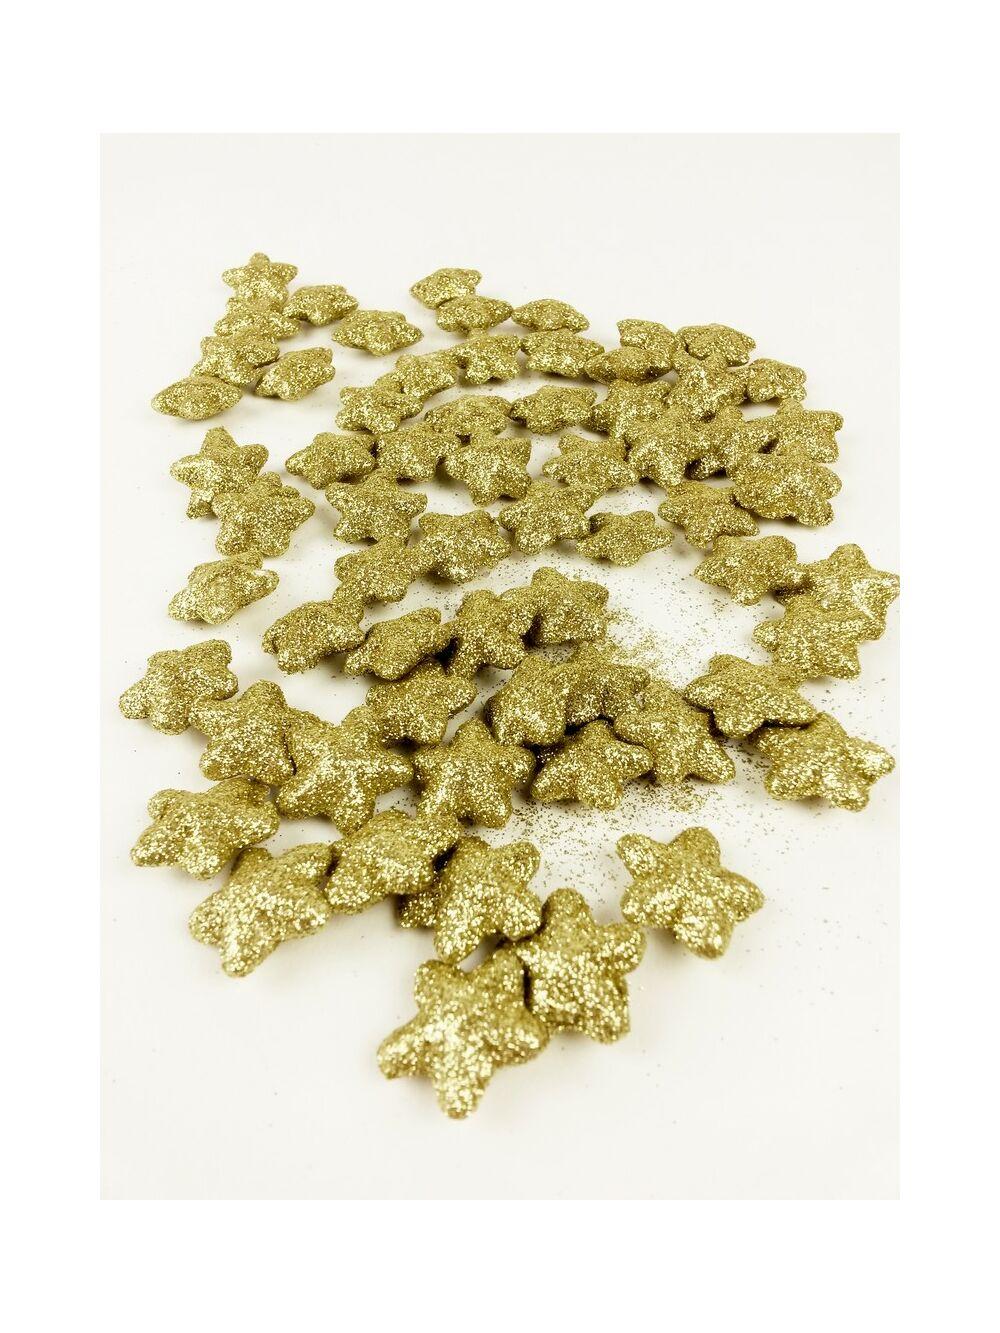 Glitteres csillag kicsi- Arany